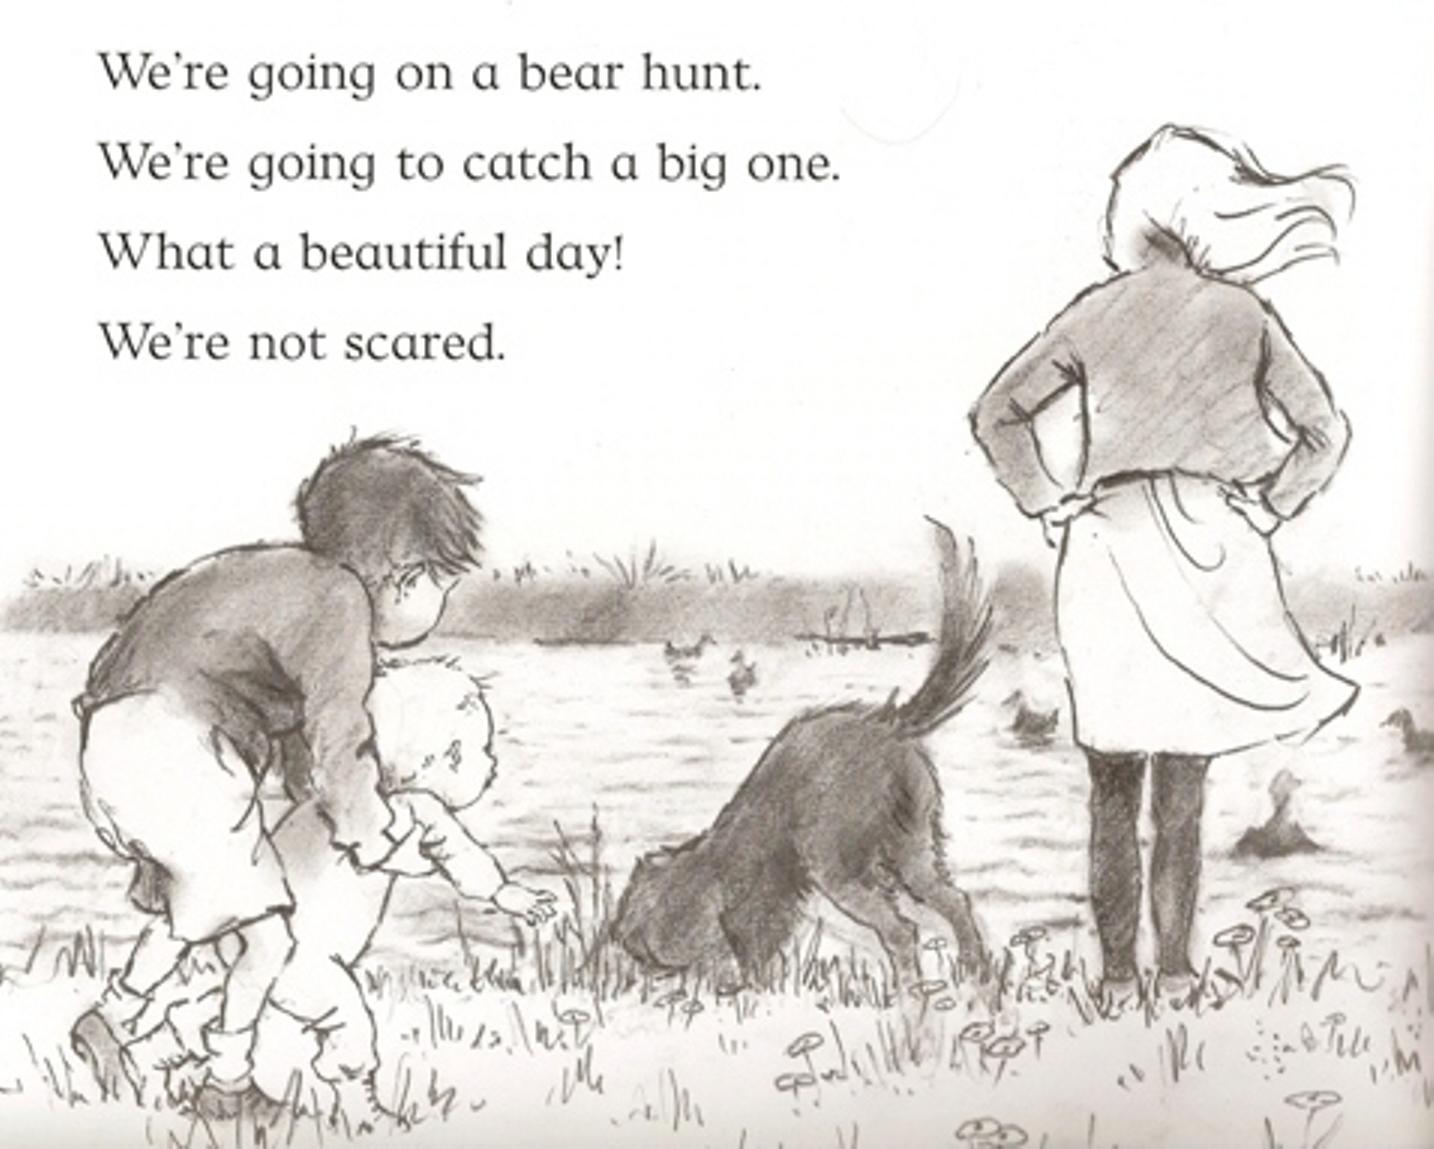 The Bear Hunt The Bear Hunt Begins